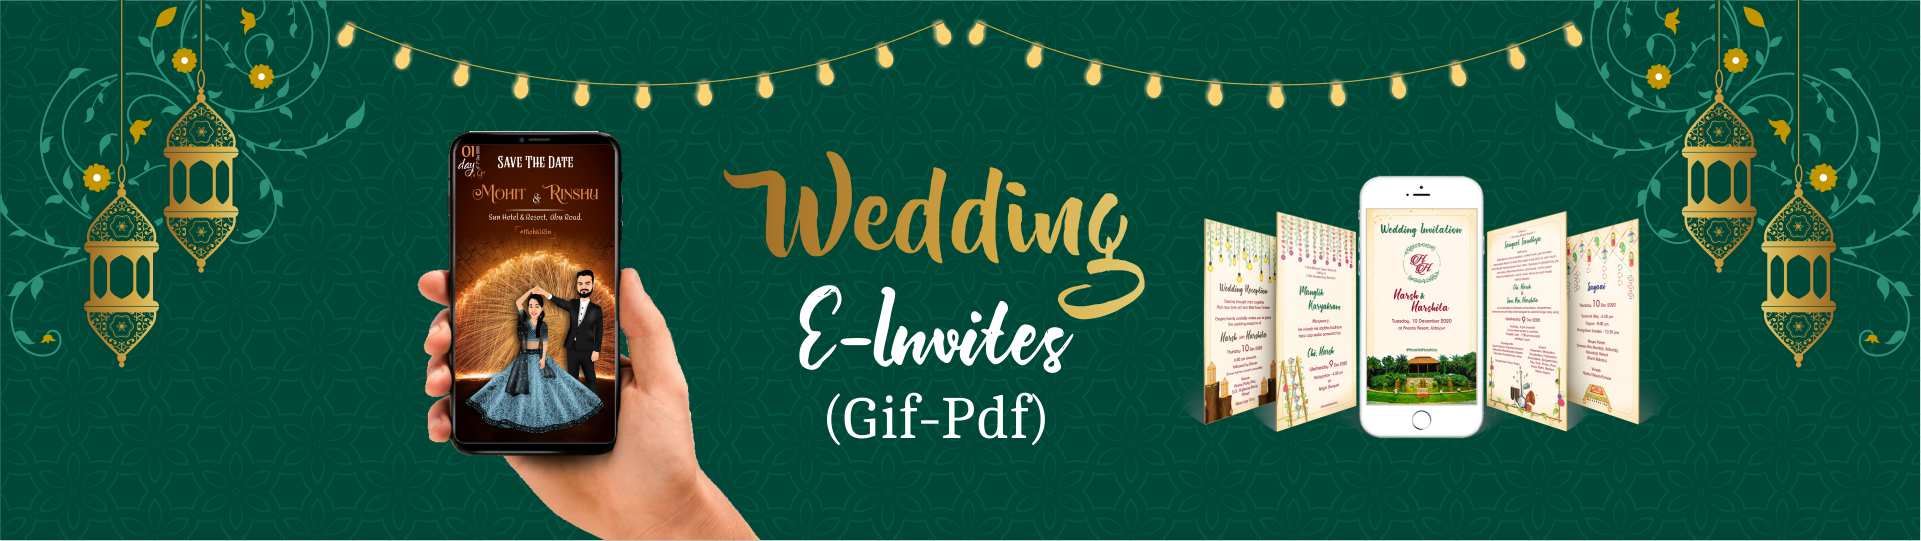 wedding-e-invites-gif-pdf